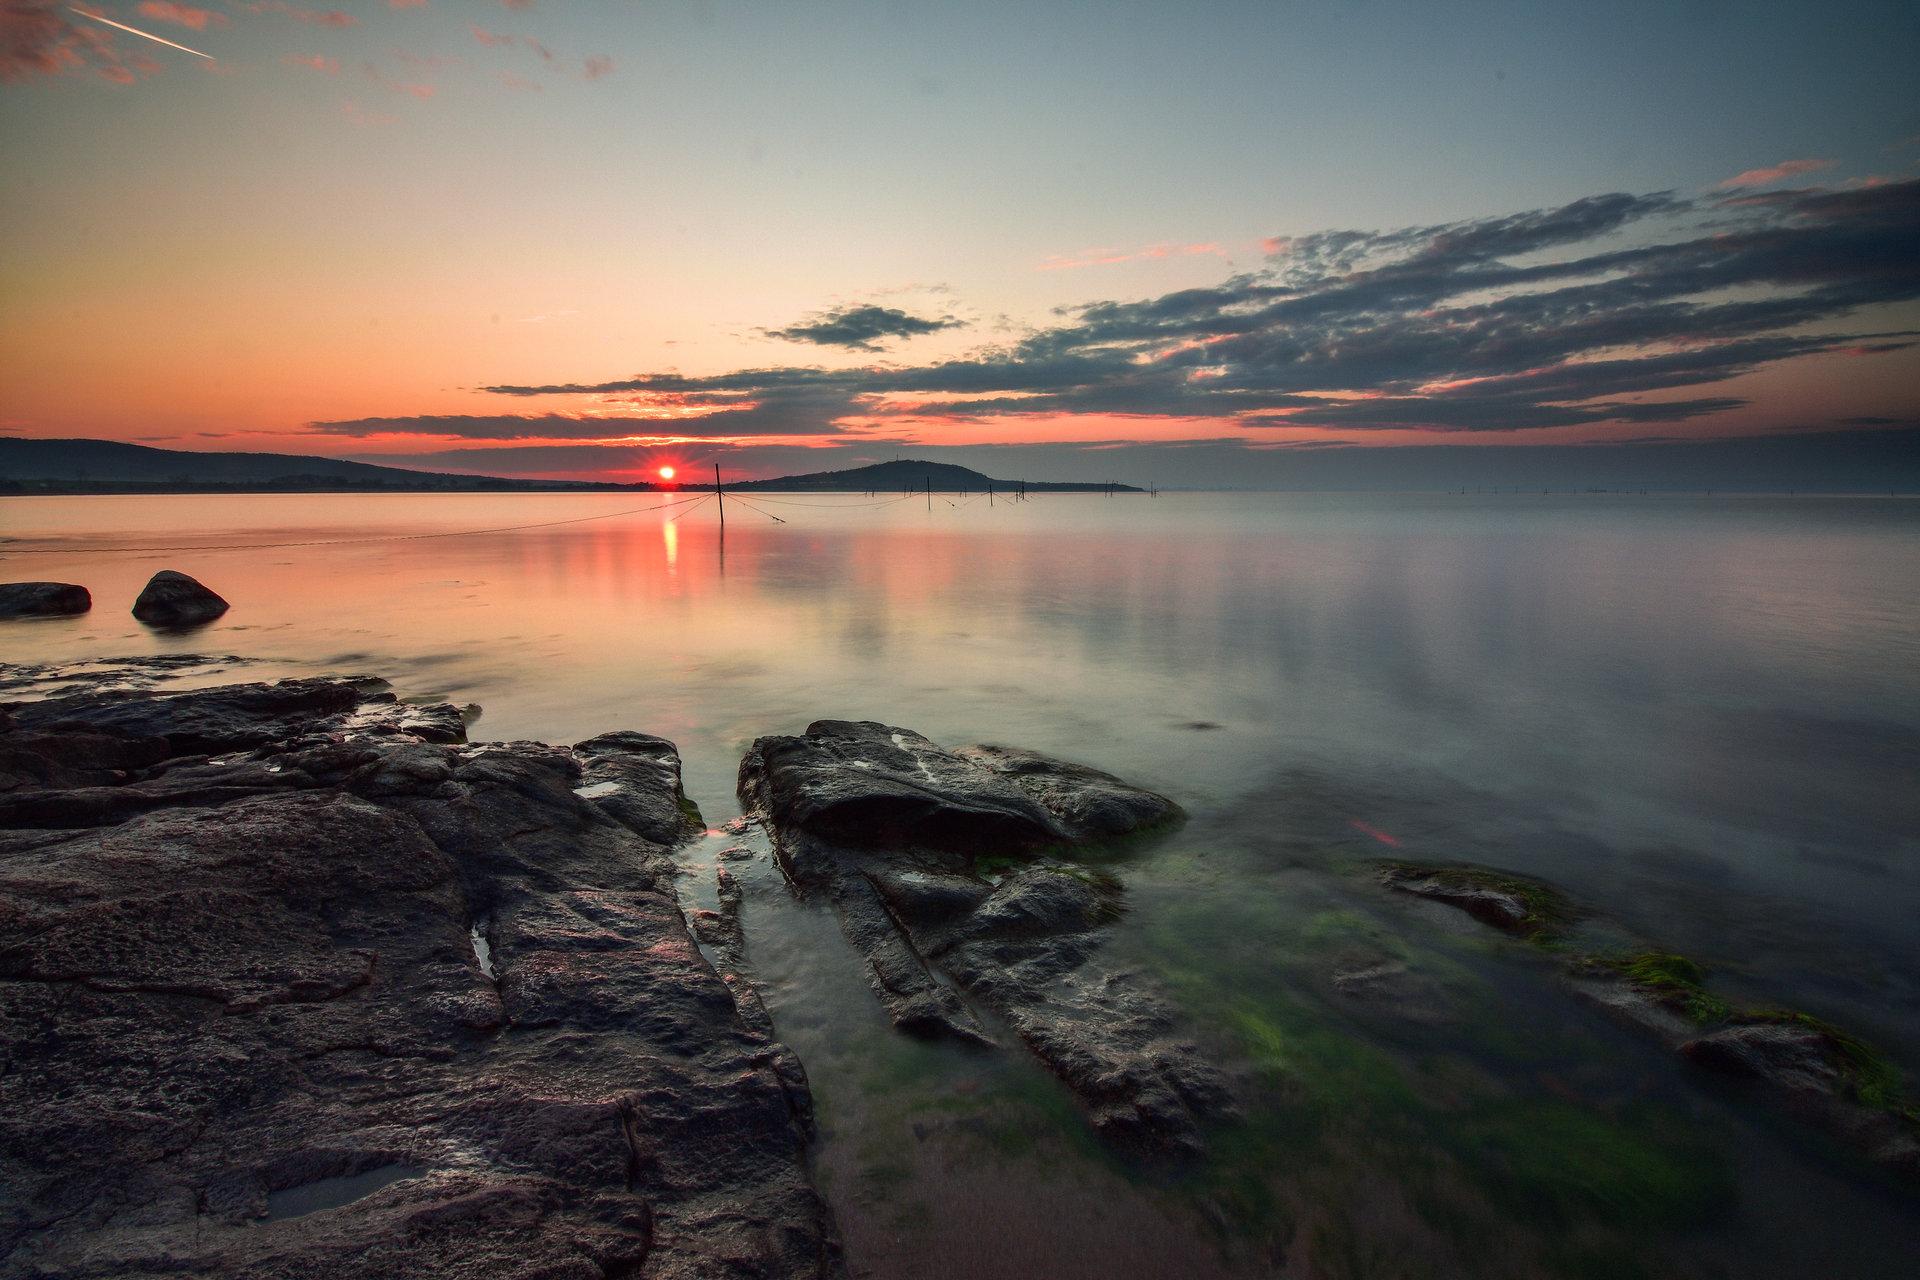 Photo in Landscape | Author Stoyan Velikov - saga446 | PHOTO FORUM